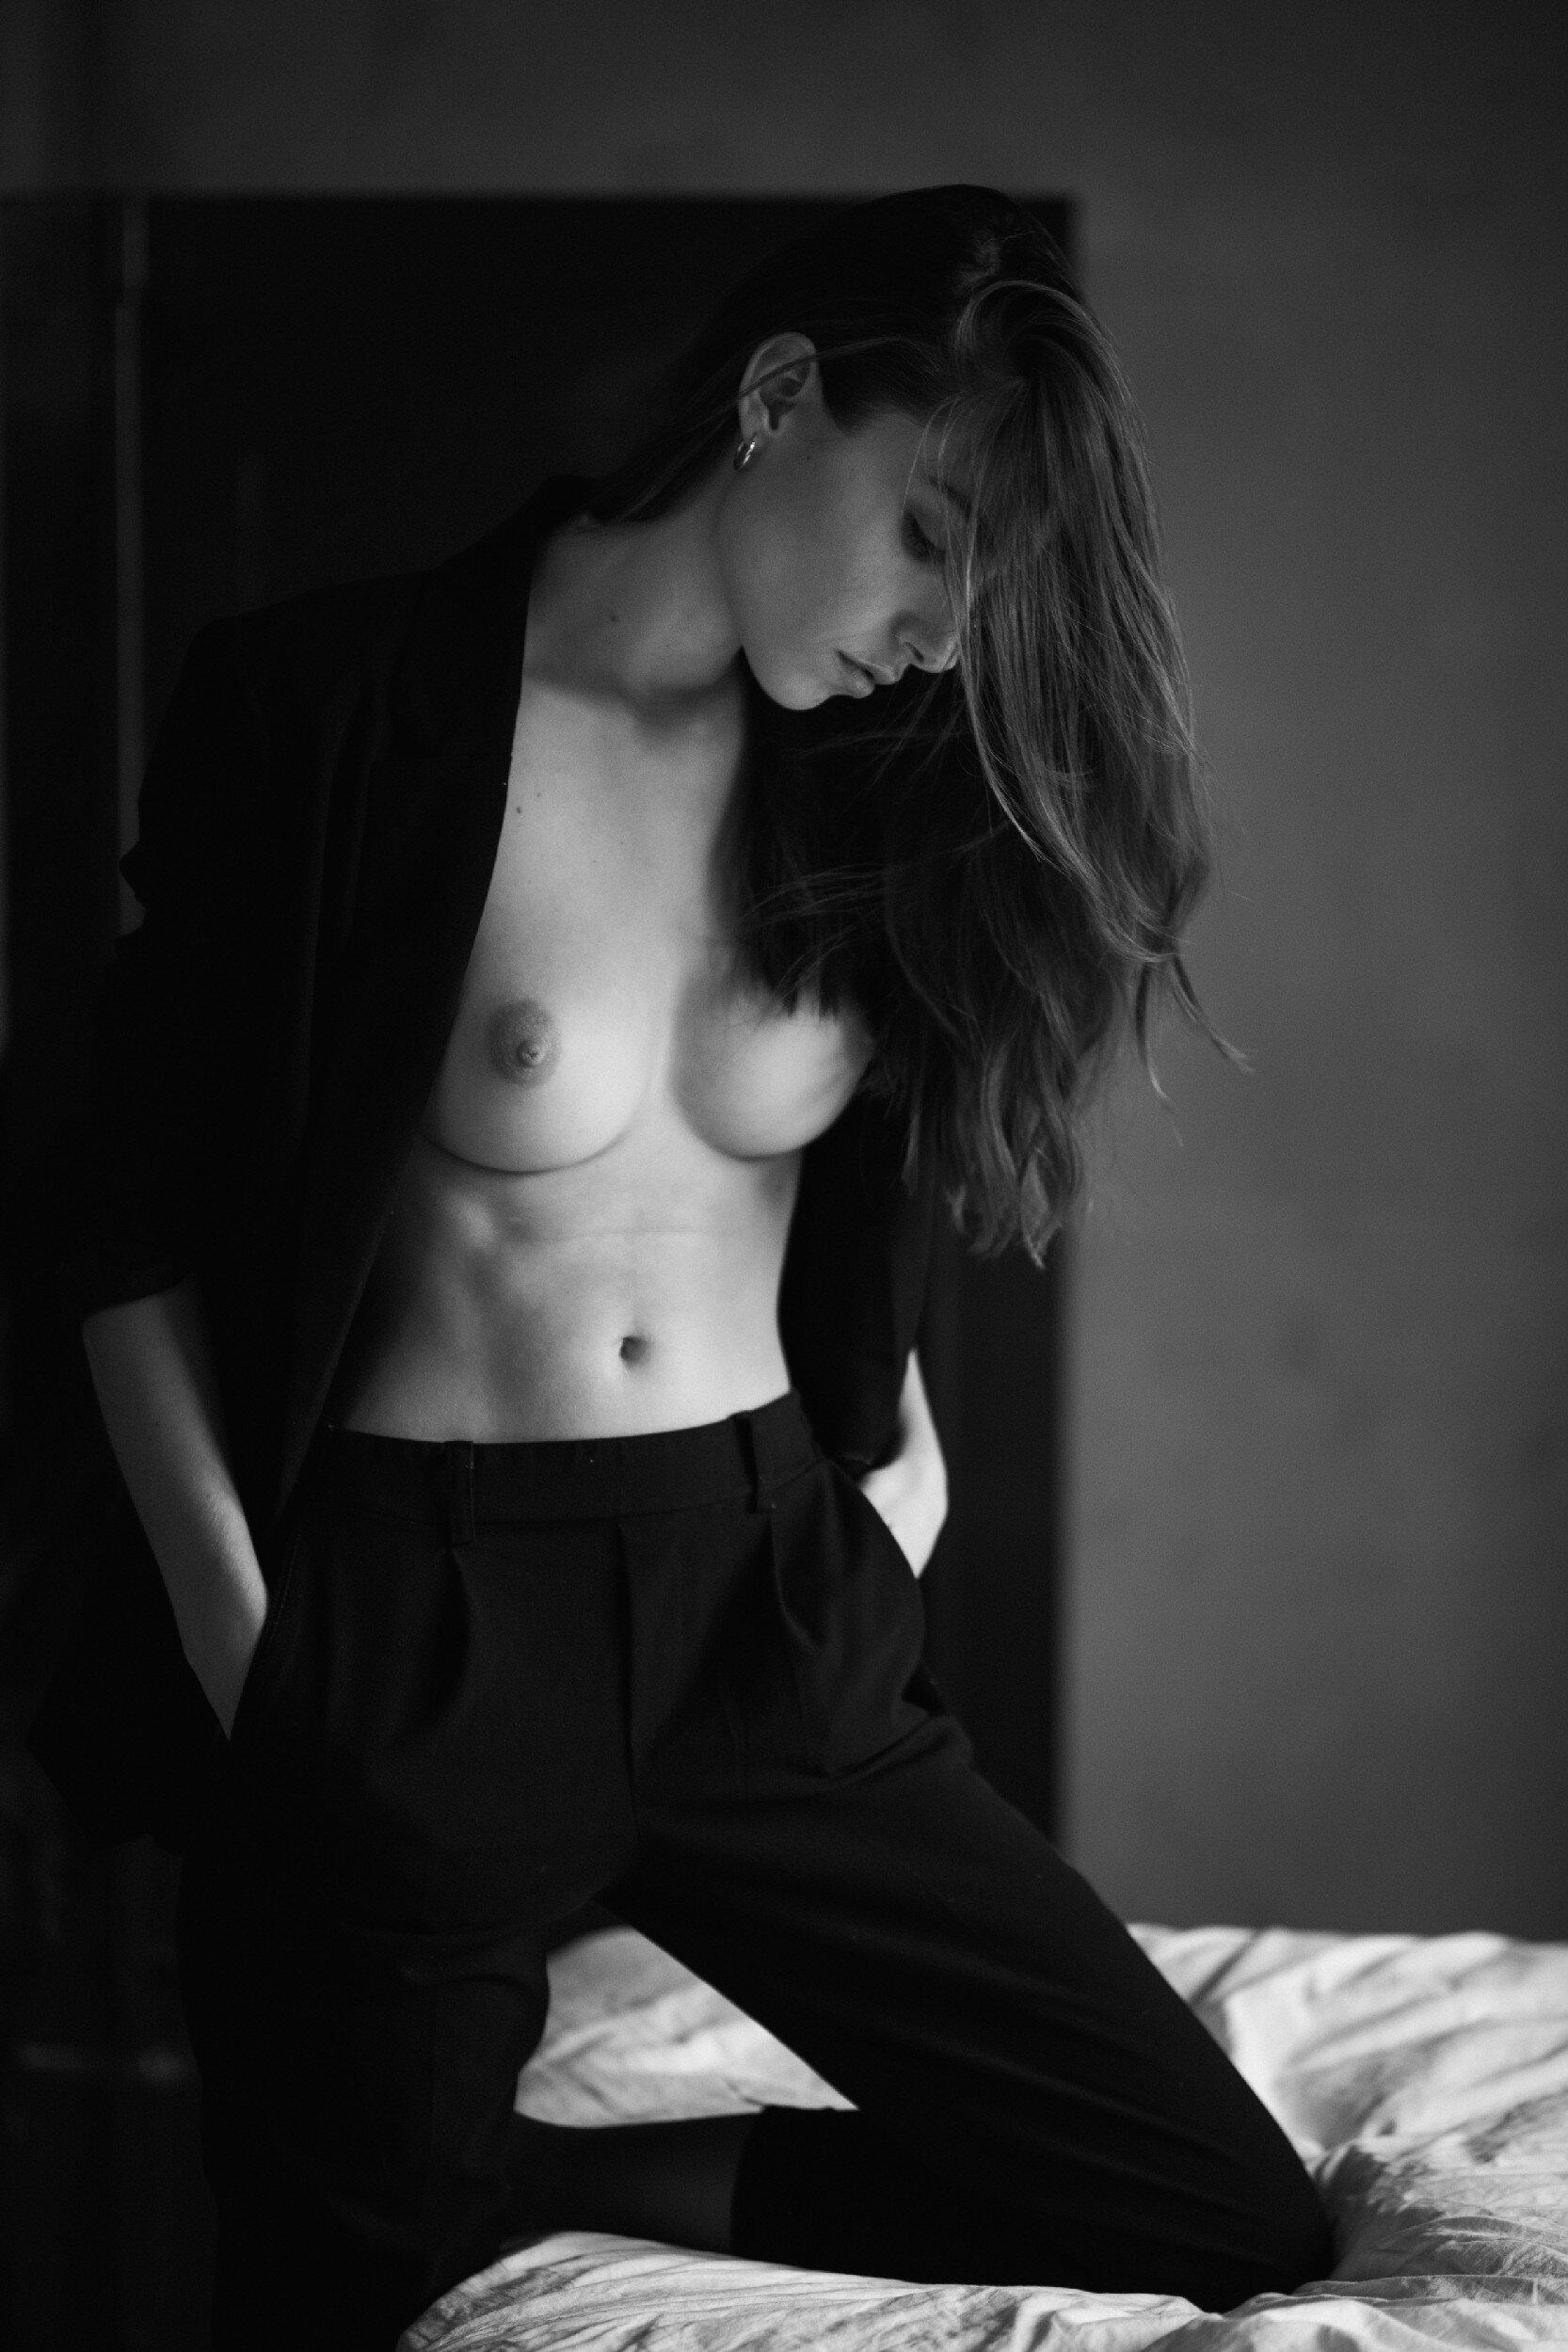 Rebecca Bagnol - Olaf Korbanek photoshoot